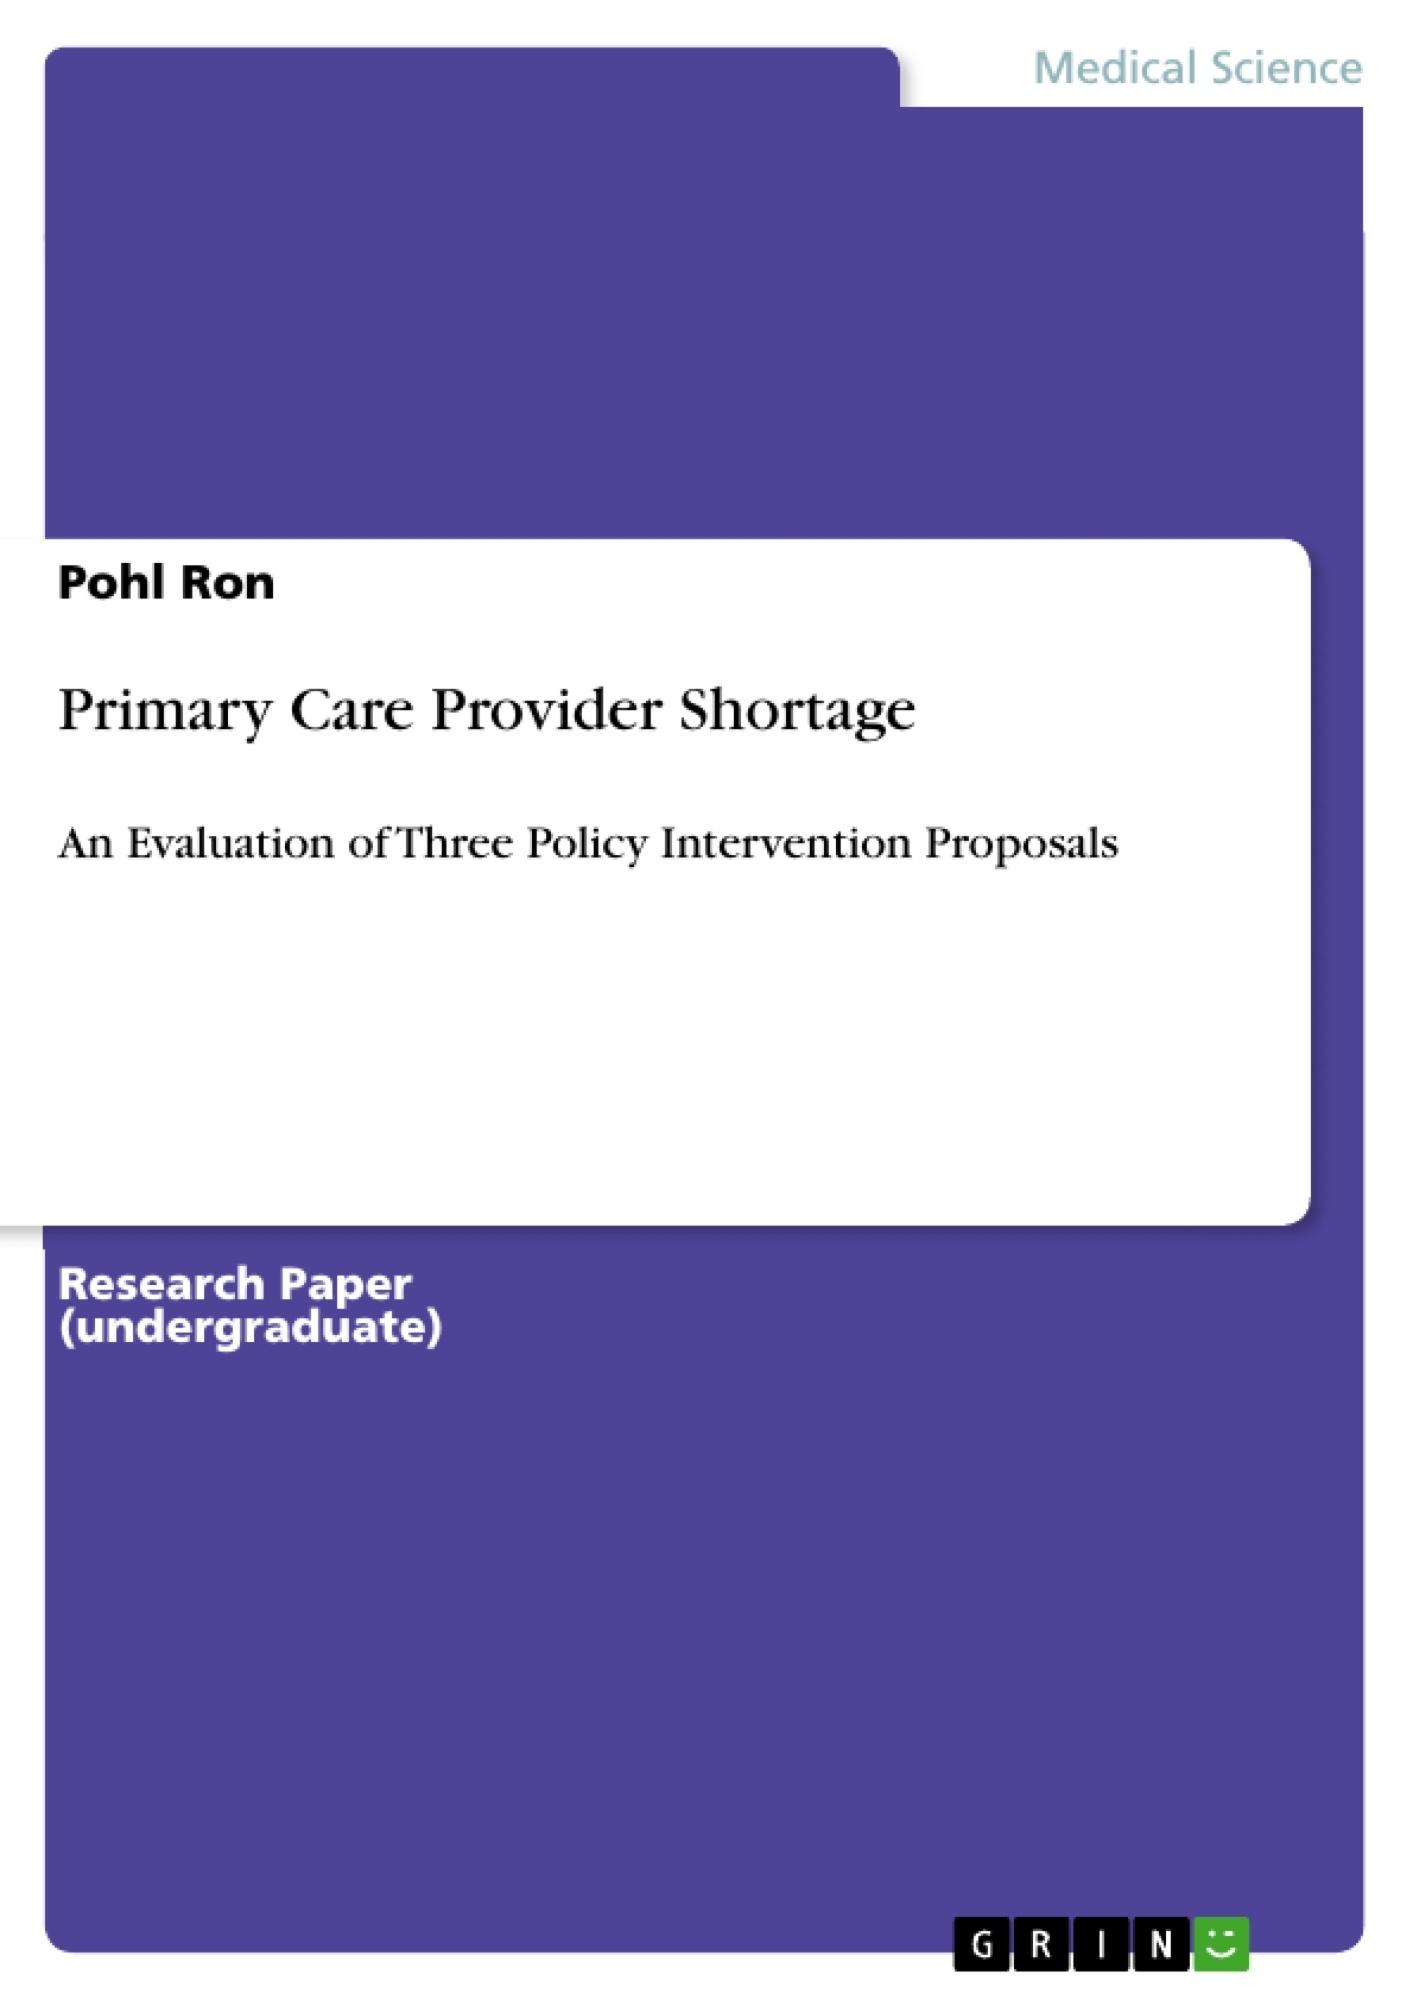 Title: Primary Care Provider Shortage